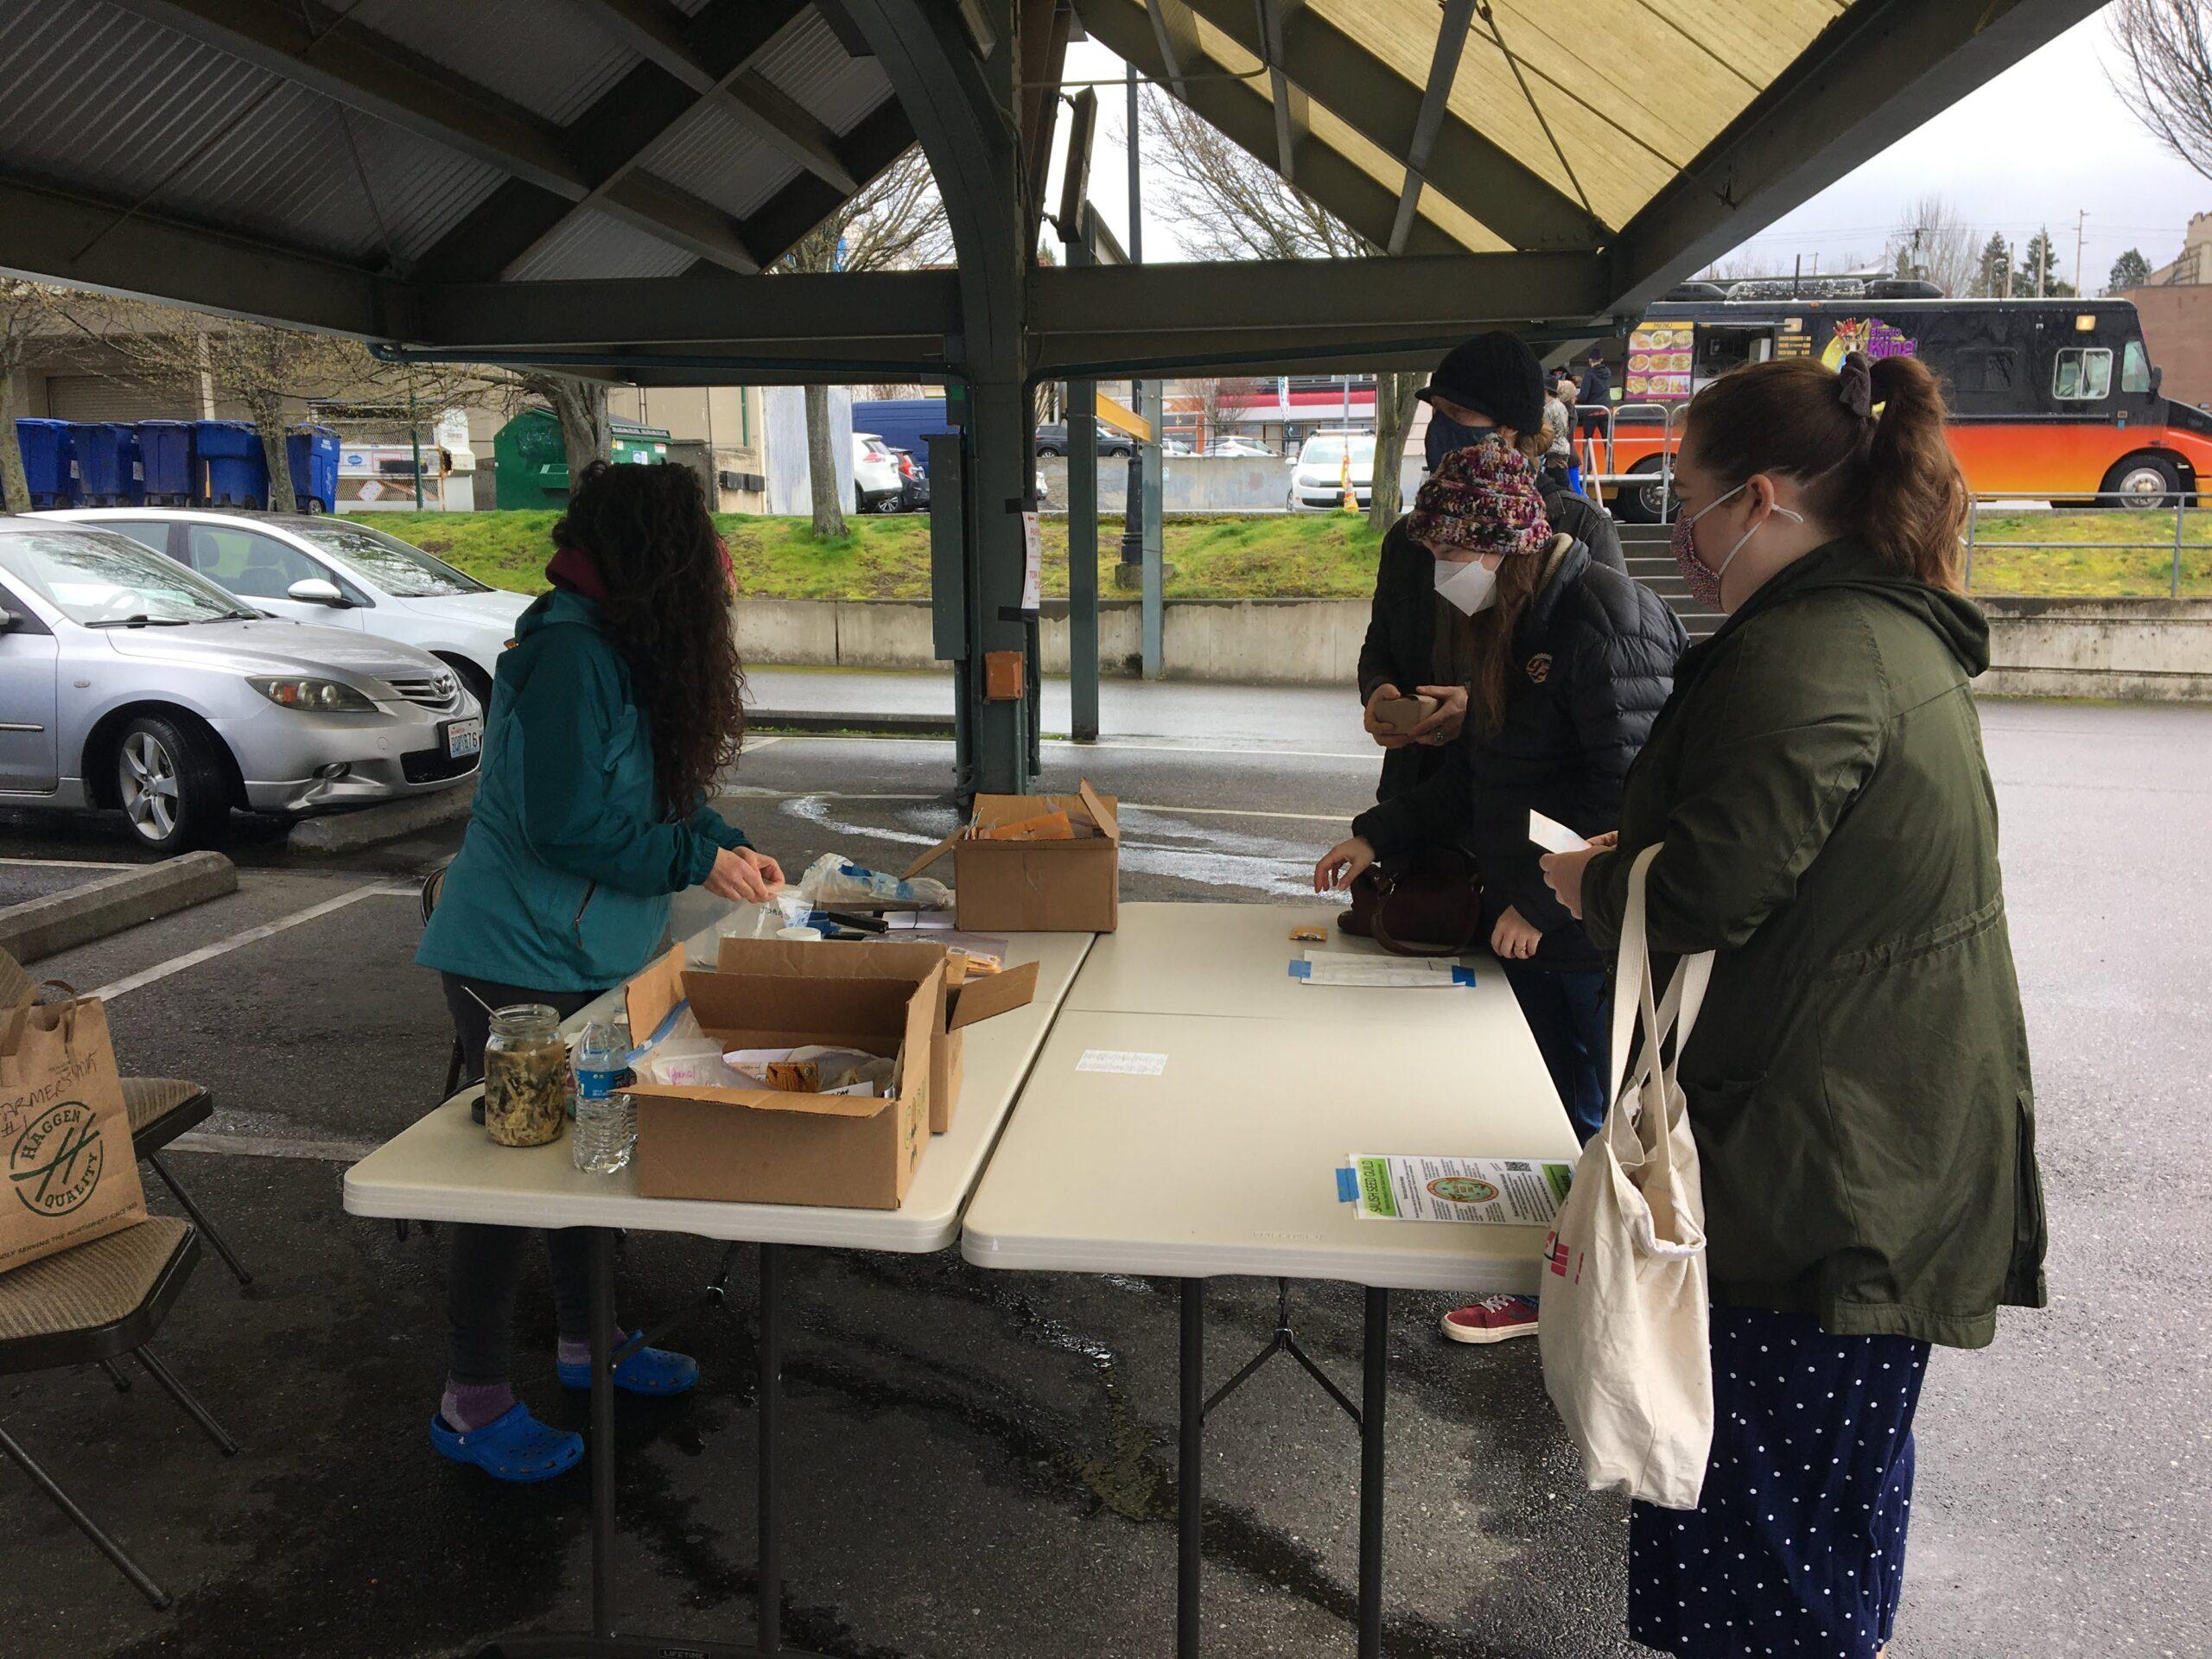 Seed Distribution at Bellingham Farmers Market